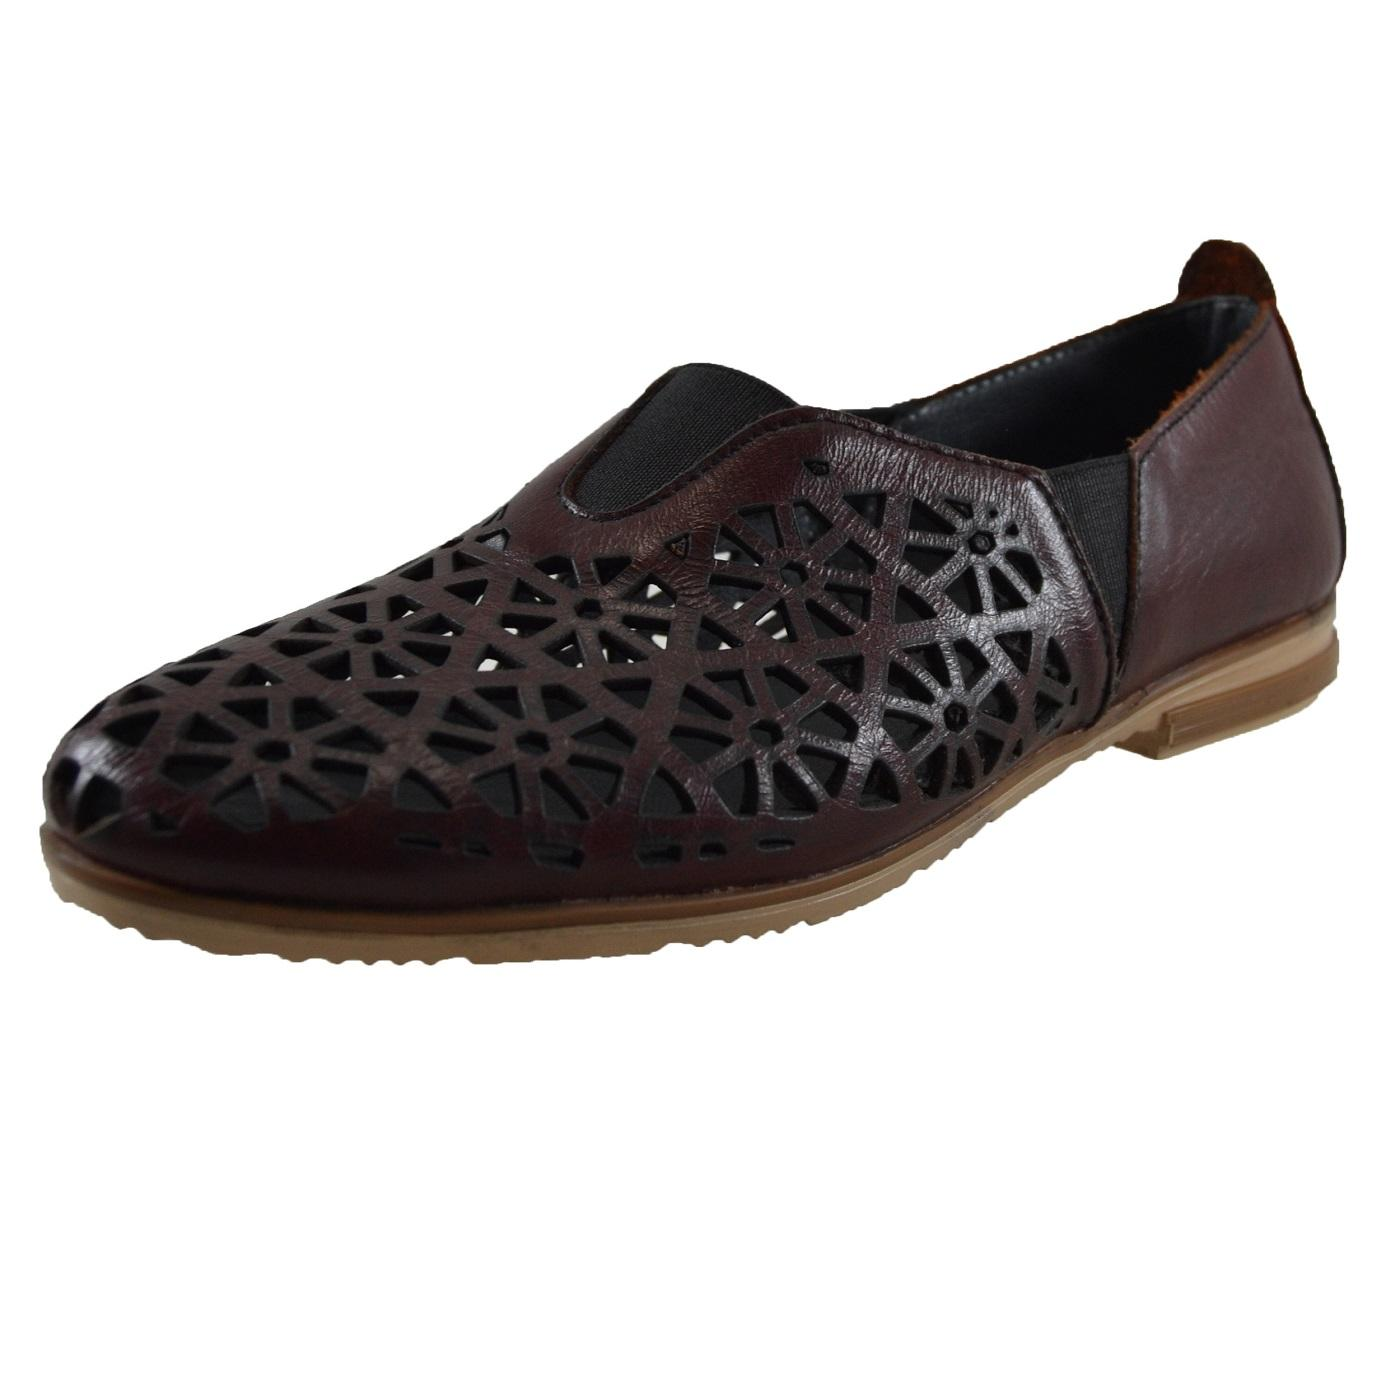 کفش زنانه کد 519 -  - 4